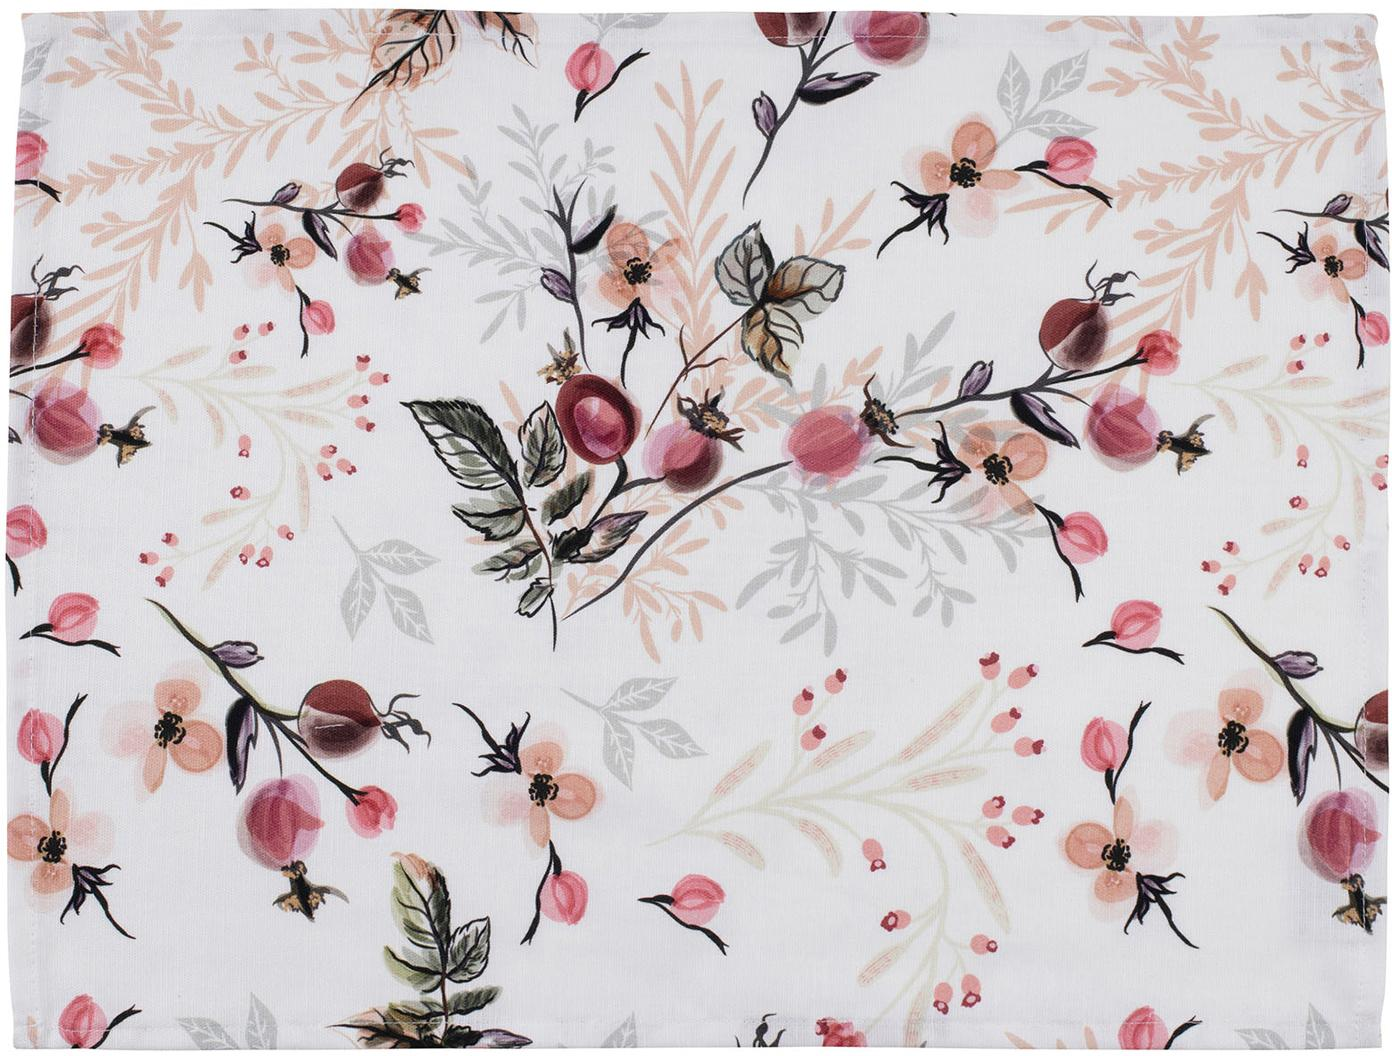 Tovaglietta Beas 2 pz, Cotone, Rosa, bianco, Larg. 38 x Lung. 50 cm